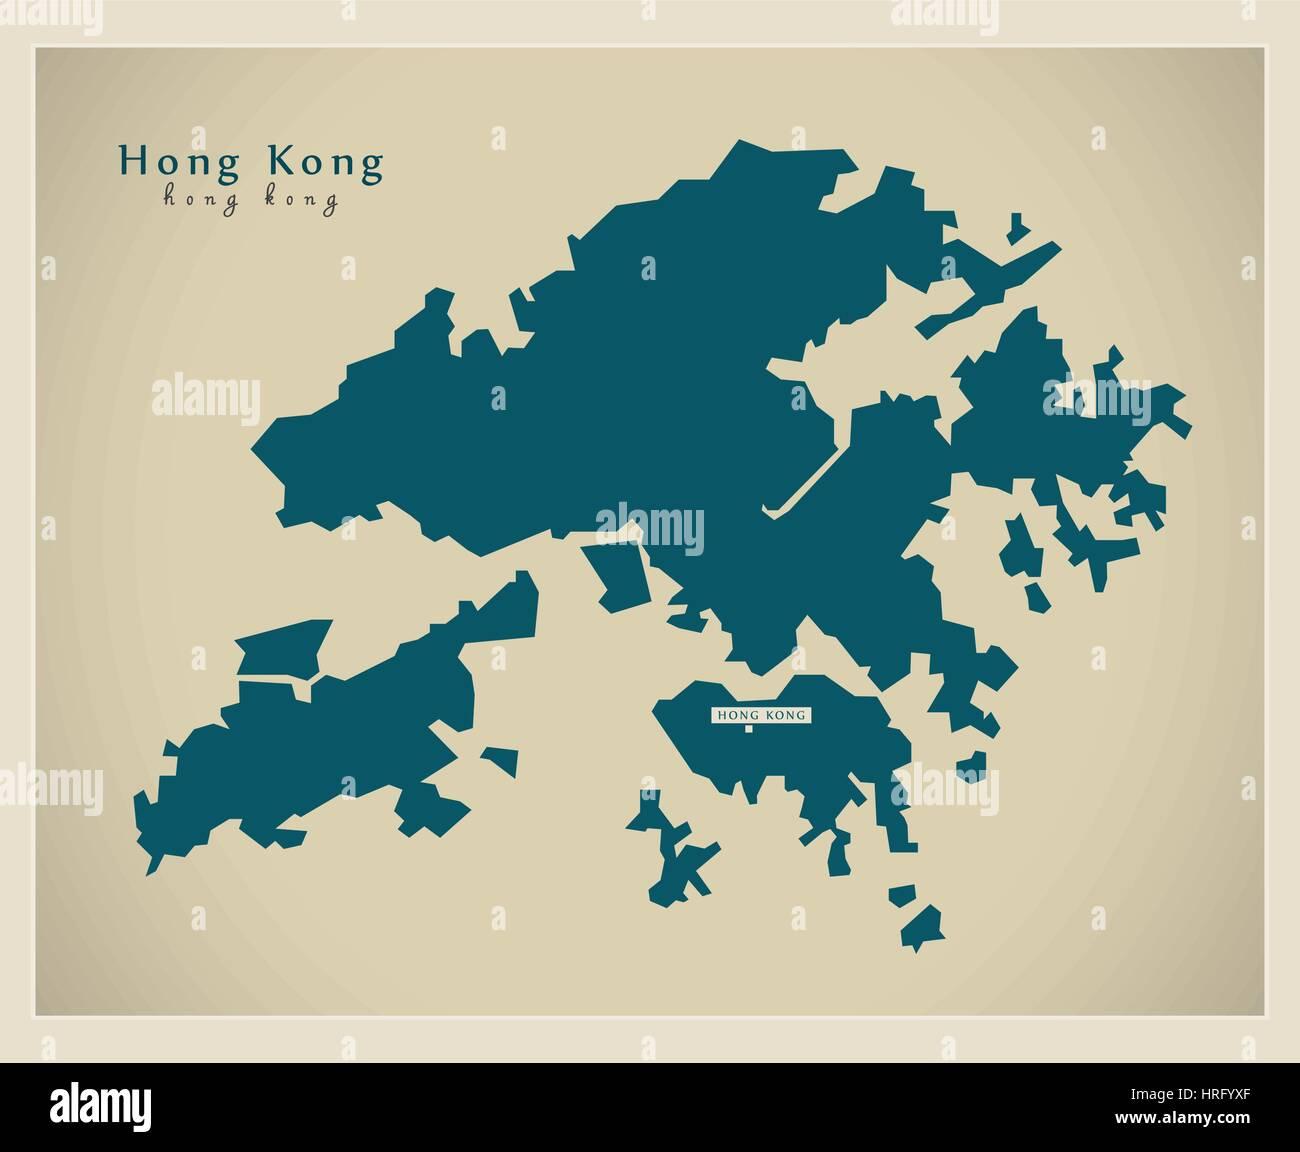 Modern Map - Hong Kong - Stock Image